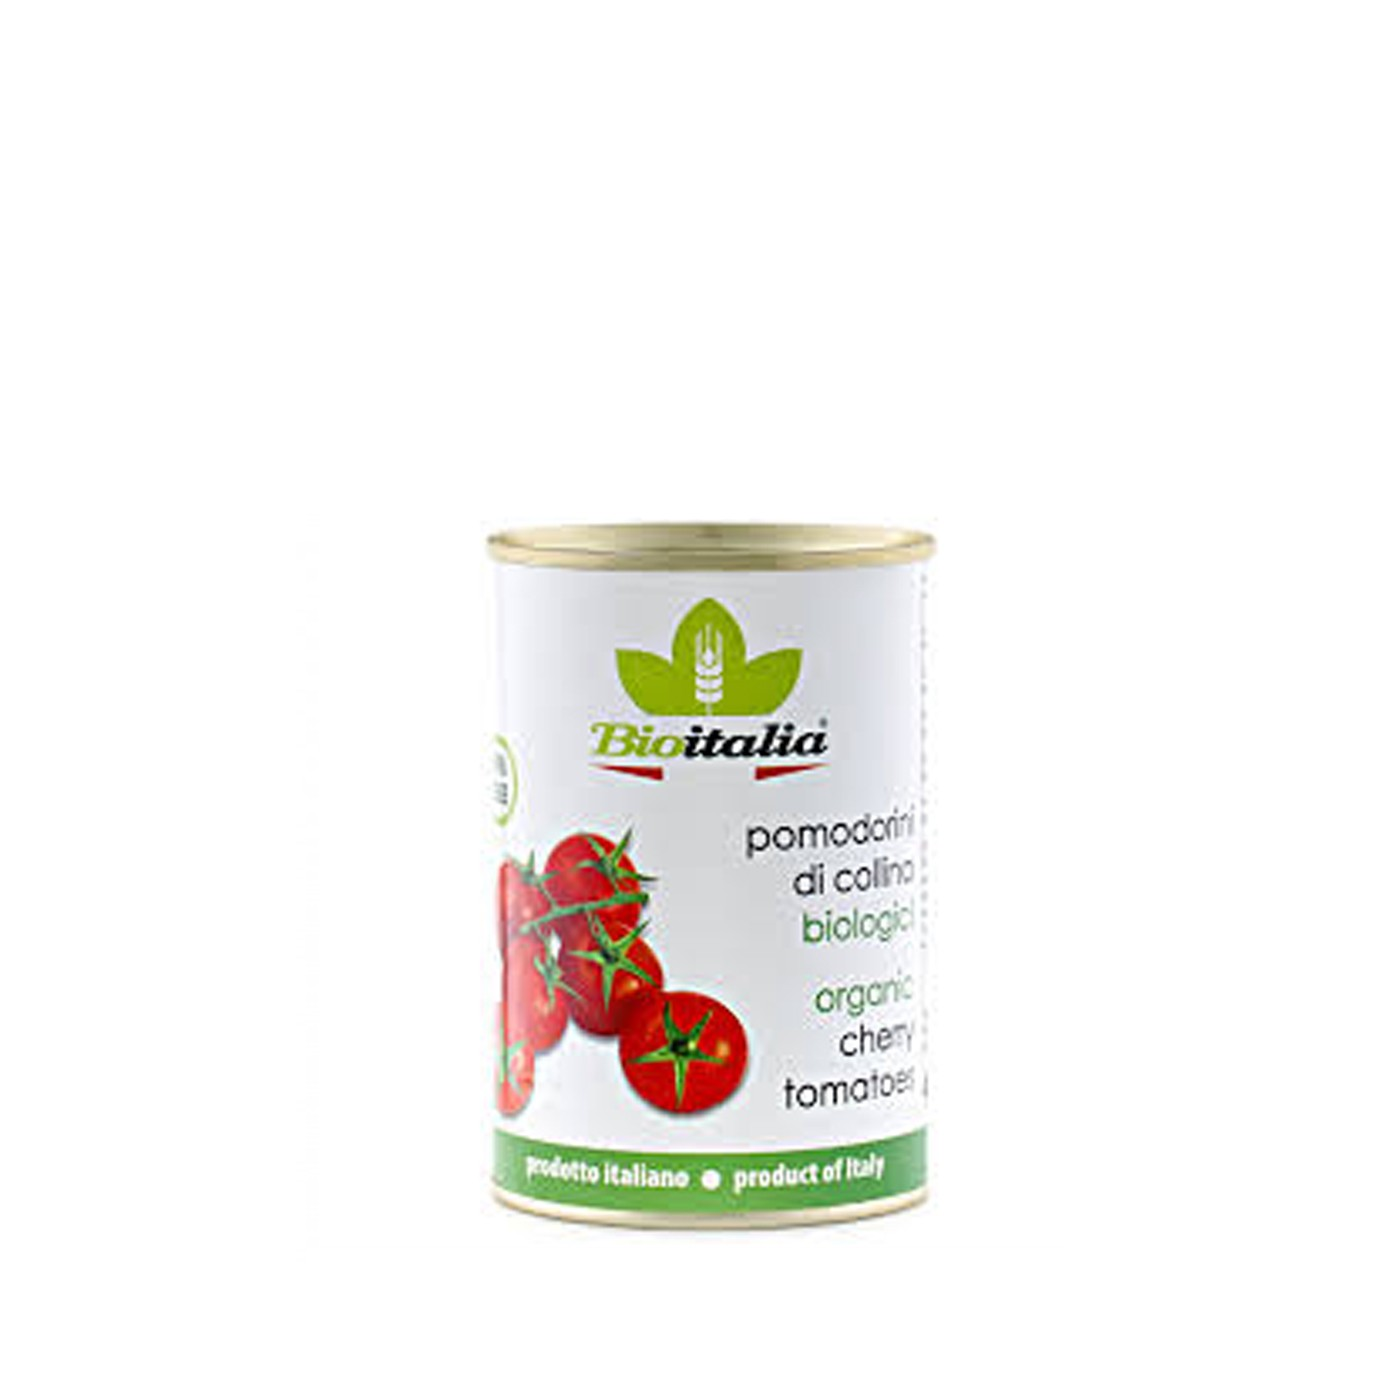 Organic Cherry Tomatoes 14 oz